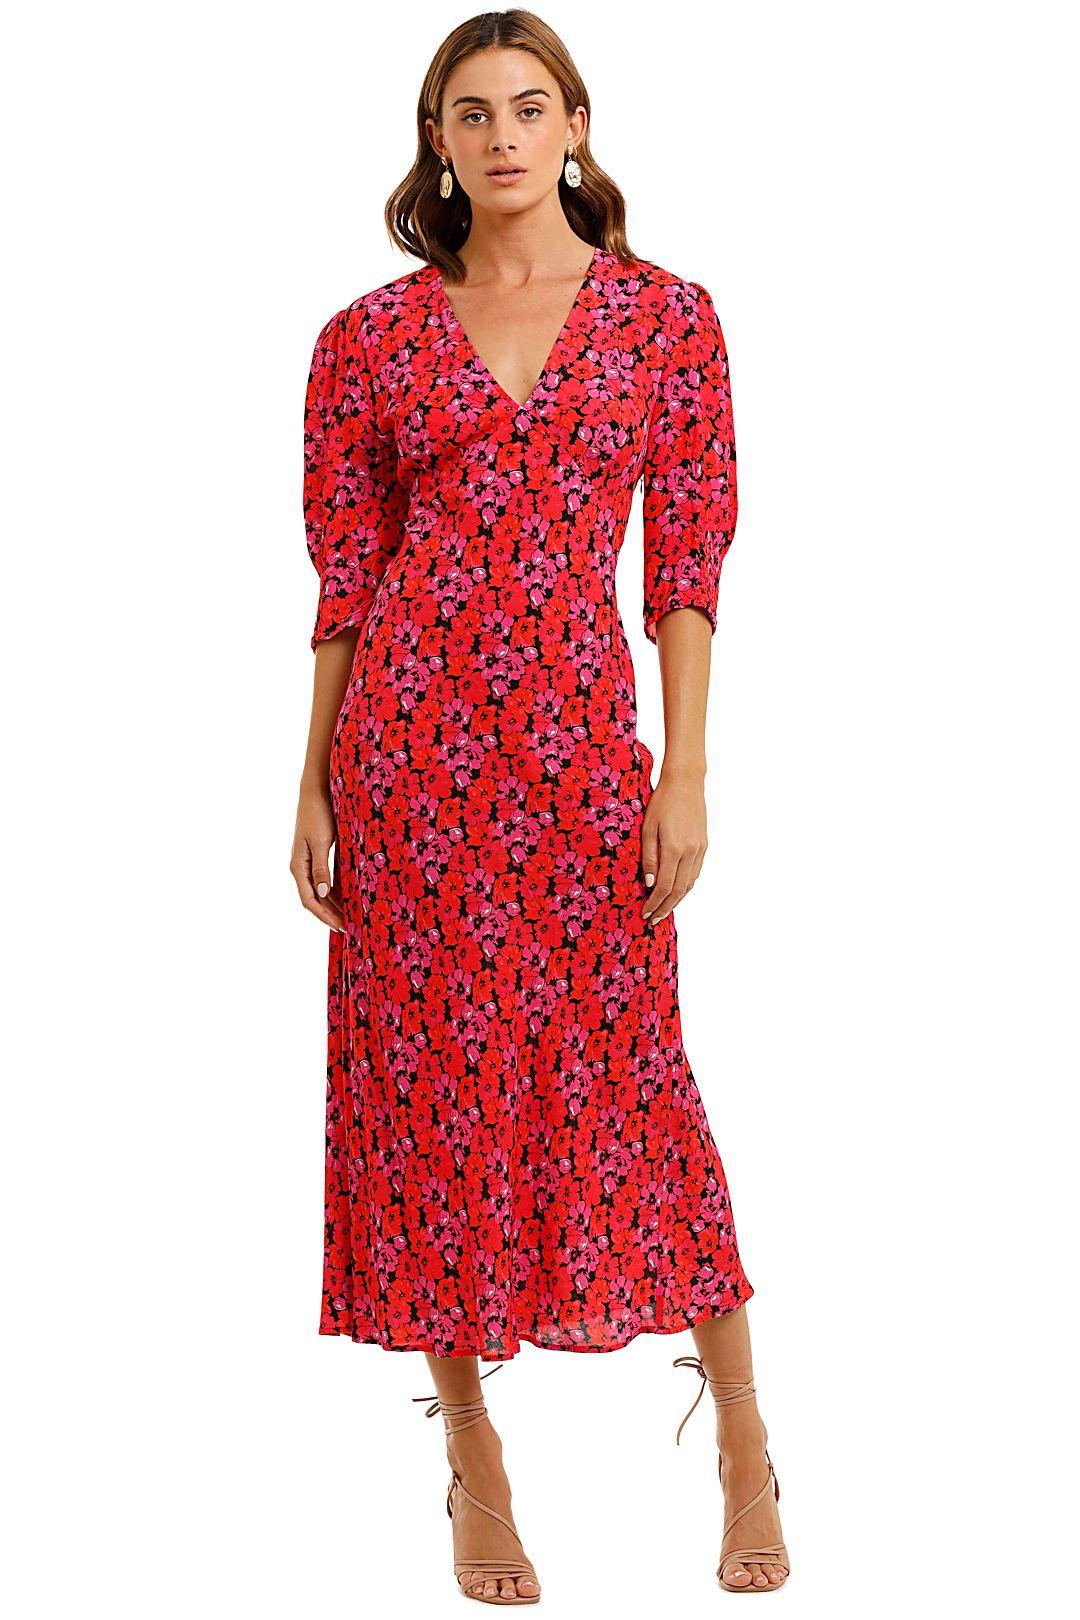 Rixo London Zadie Maxi Dress